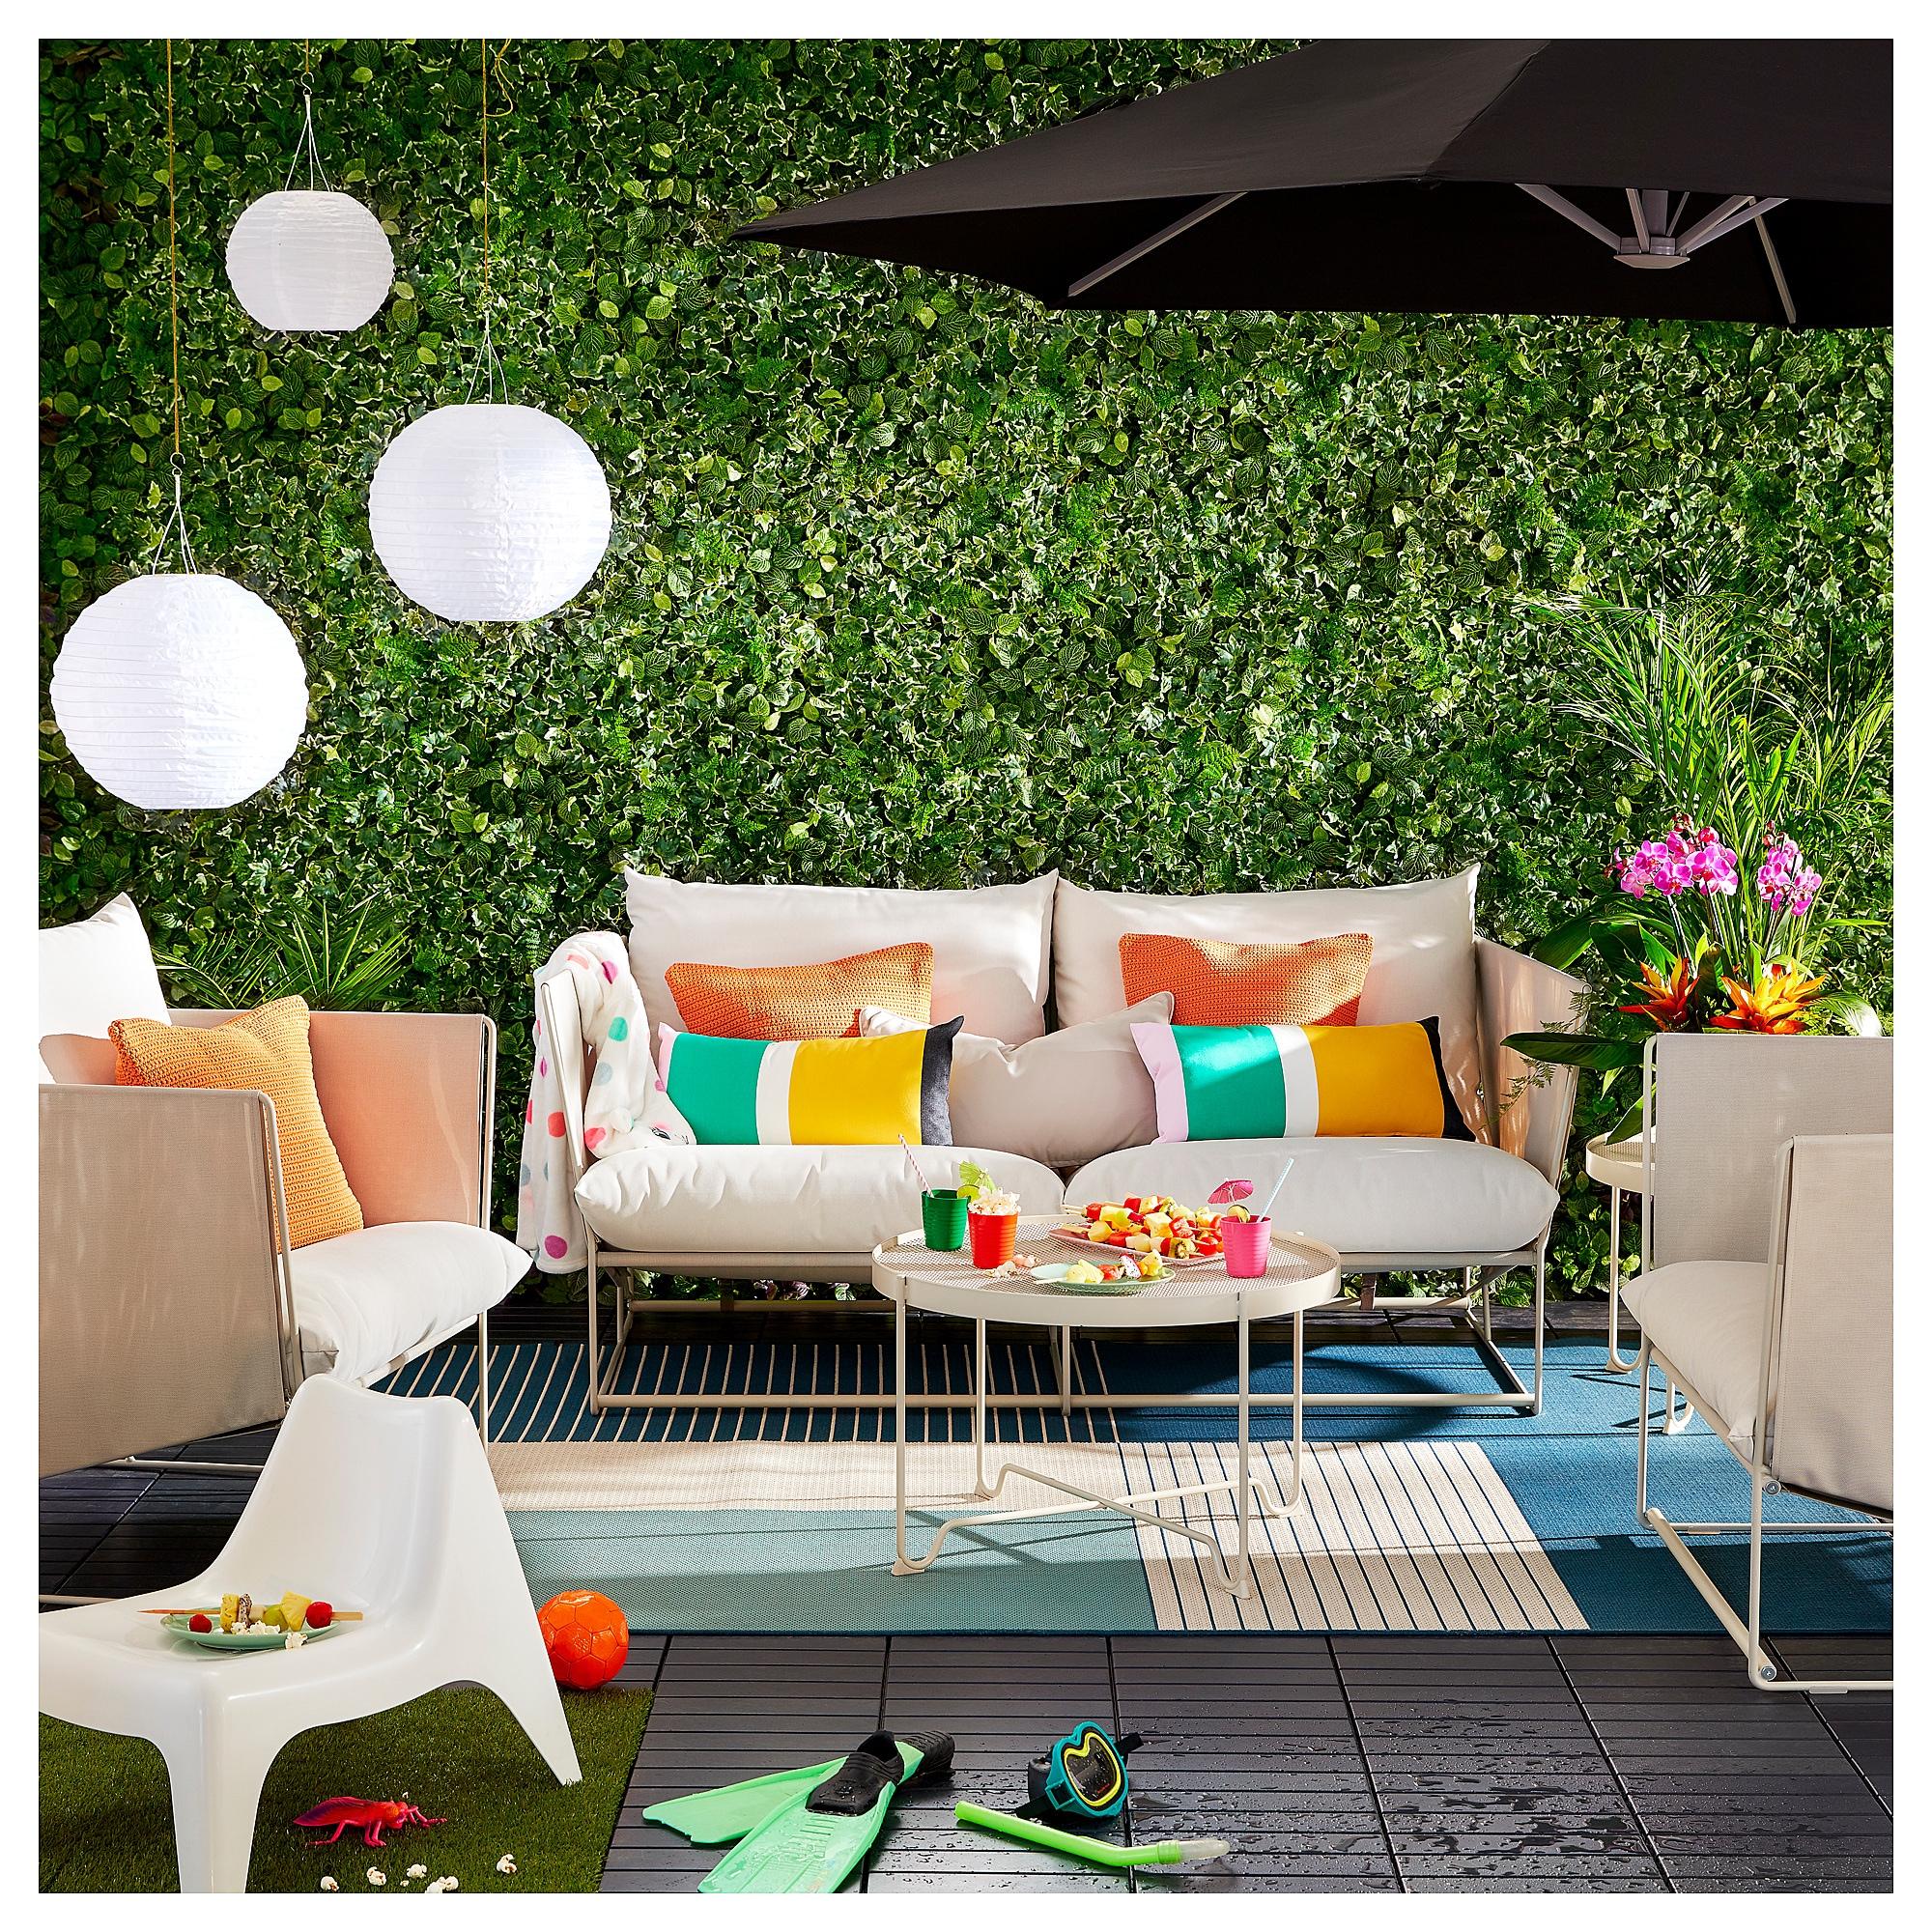 Ikea Patio Decor Trendy Color Cushions and Lanterns